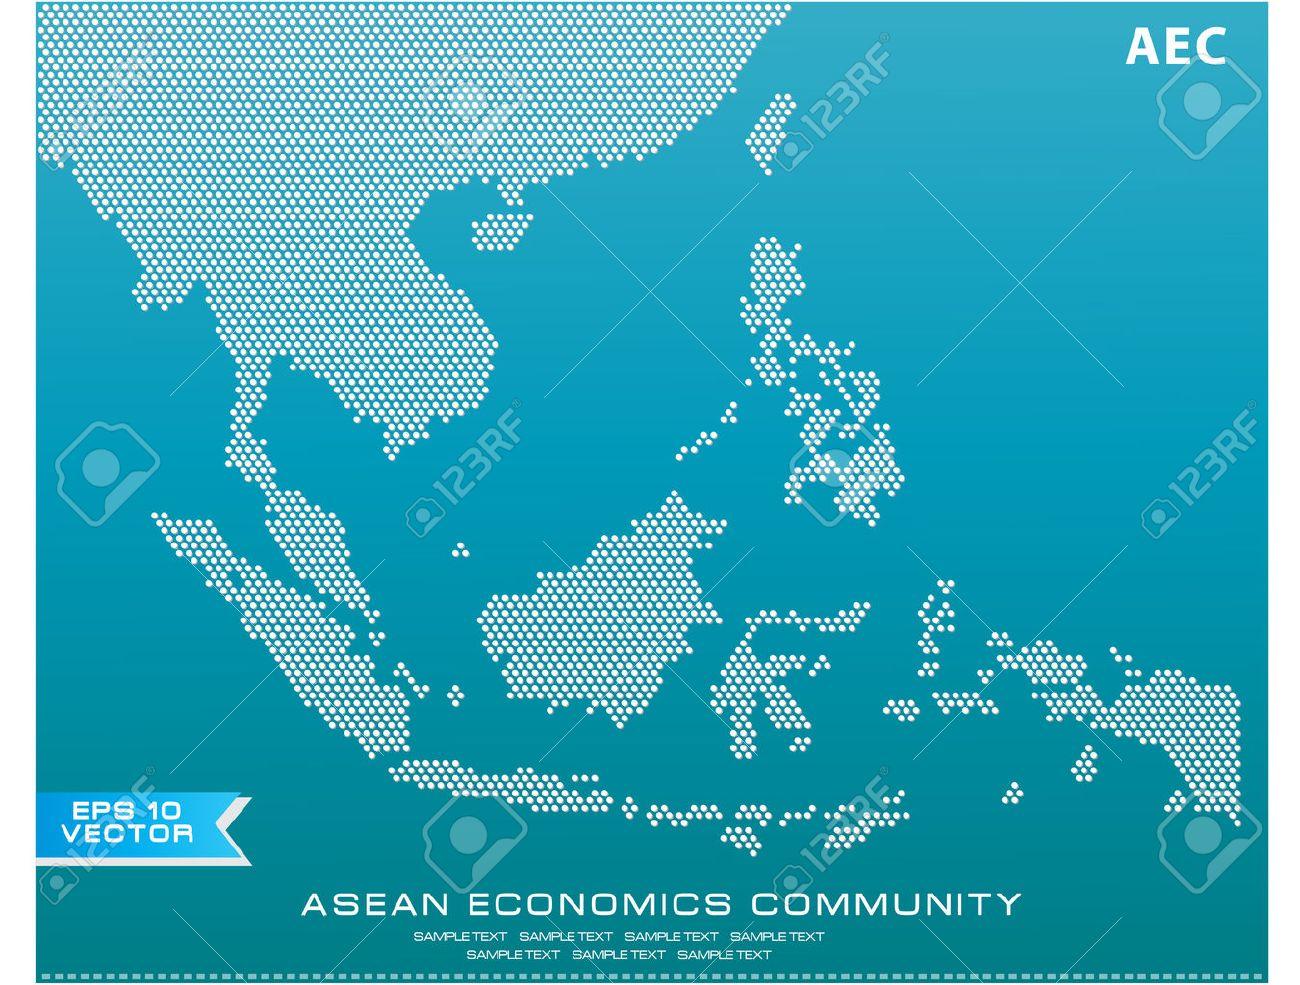 asean マップ点線スタイルのイラスト、背景 (aec、afta、asean